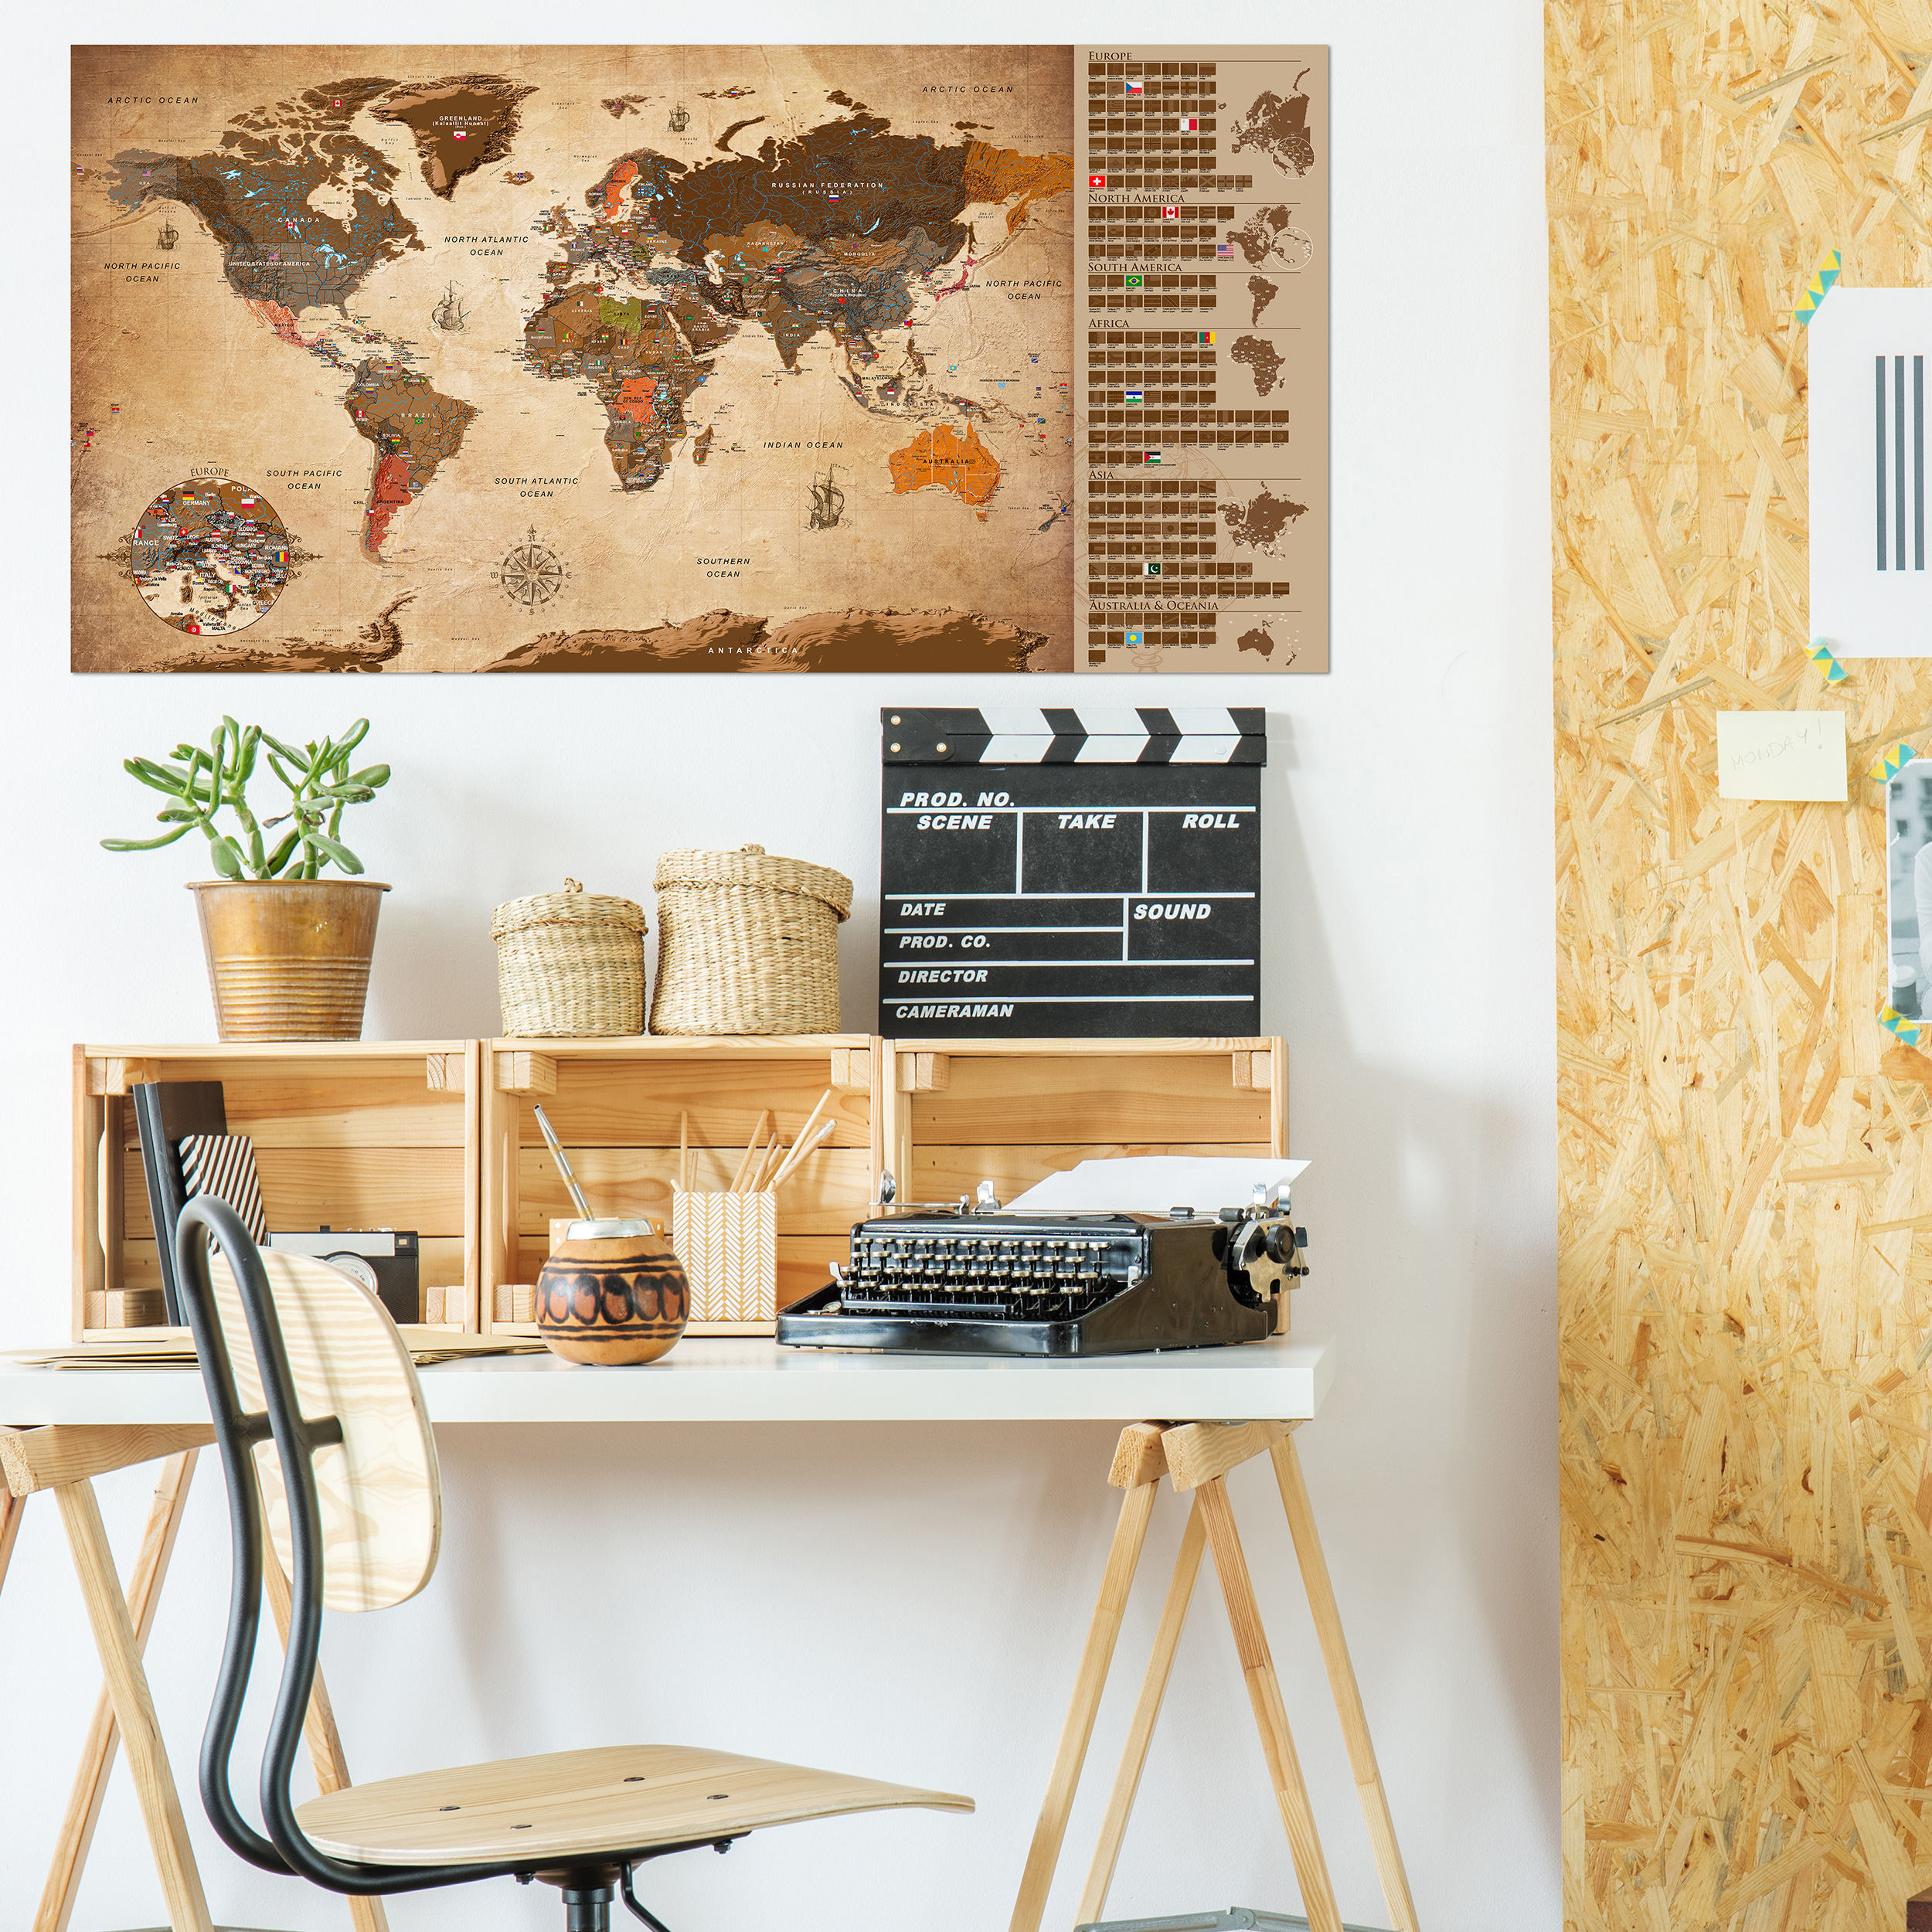 rubbel weltkarte zum rubbeln scratch off rubbelposter poster landkarte laminiert ebay. Black Bedroom Furniture Sets. Home Design Ideas